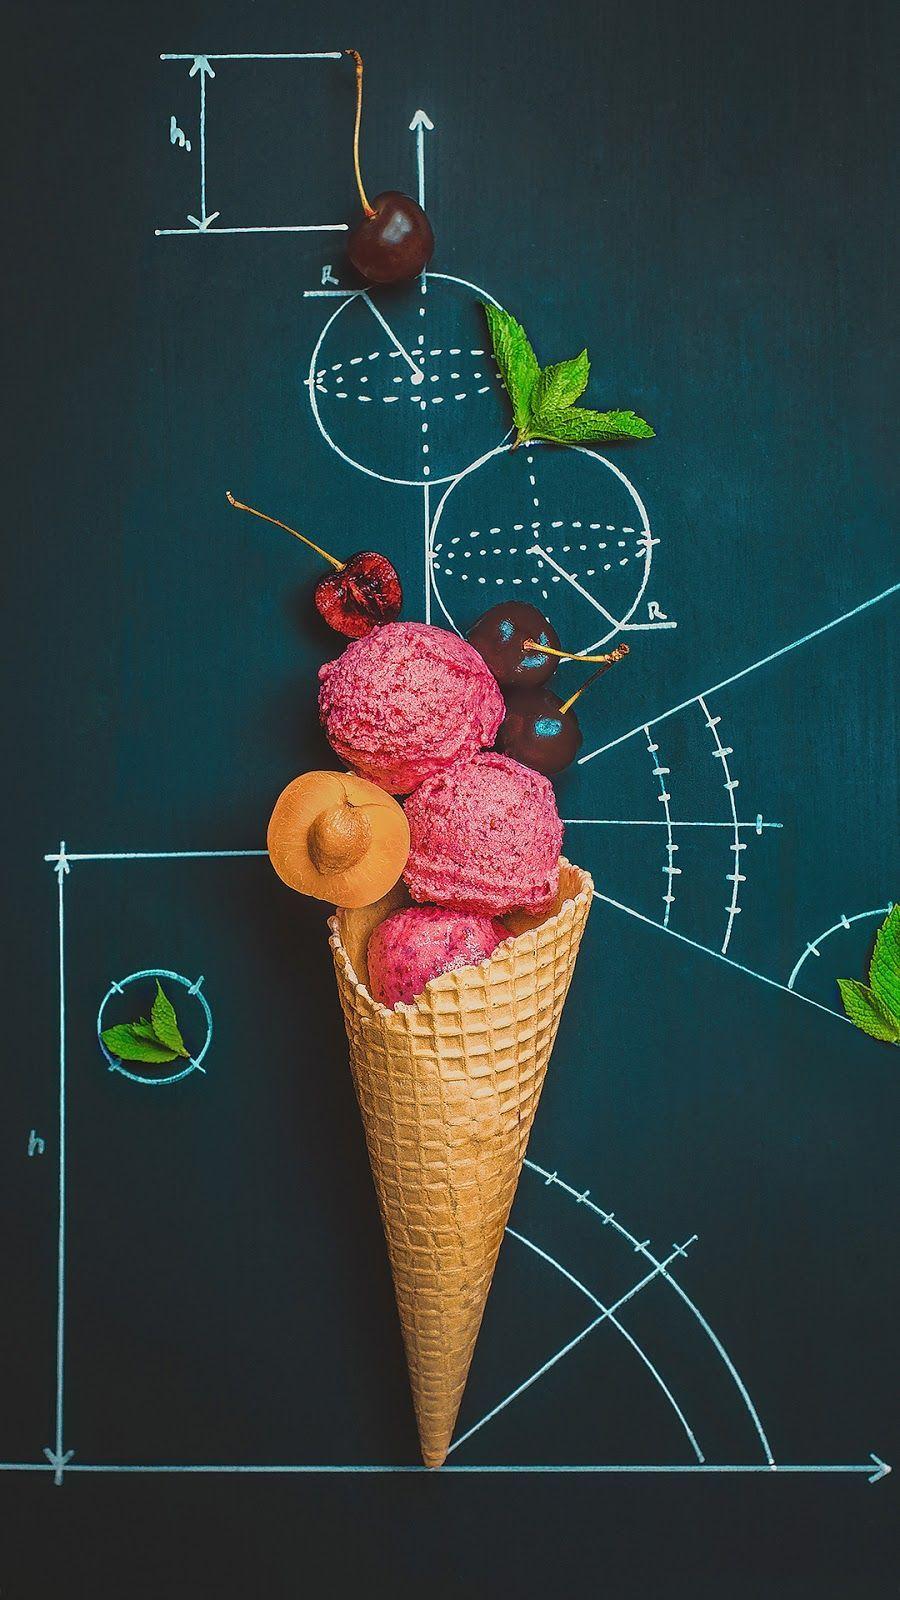 ice cream wallpaper 3